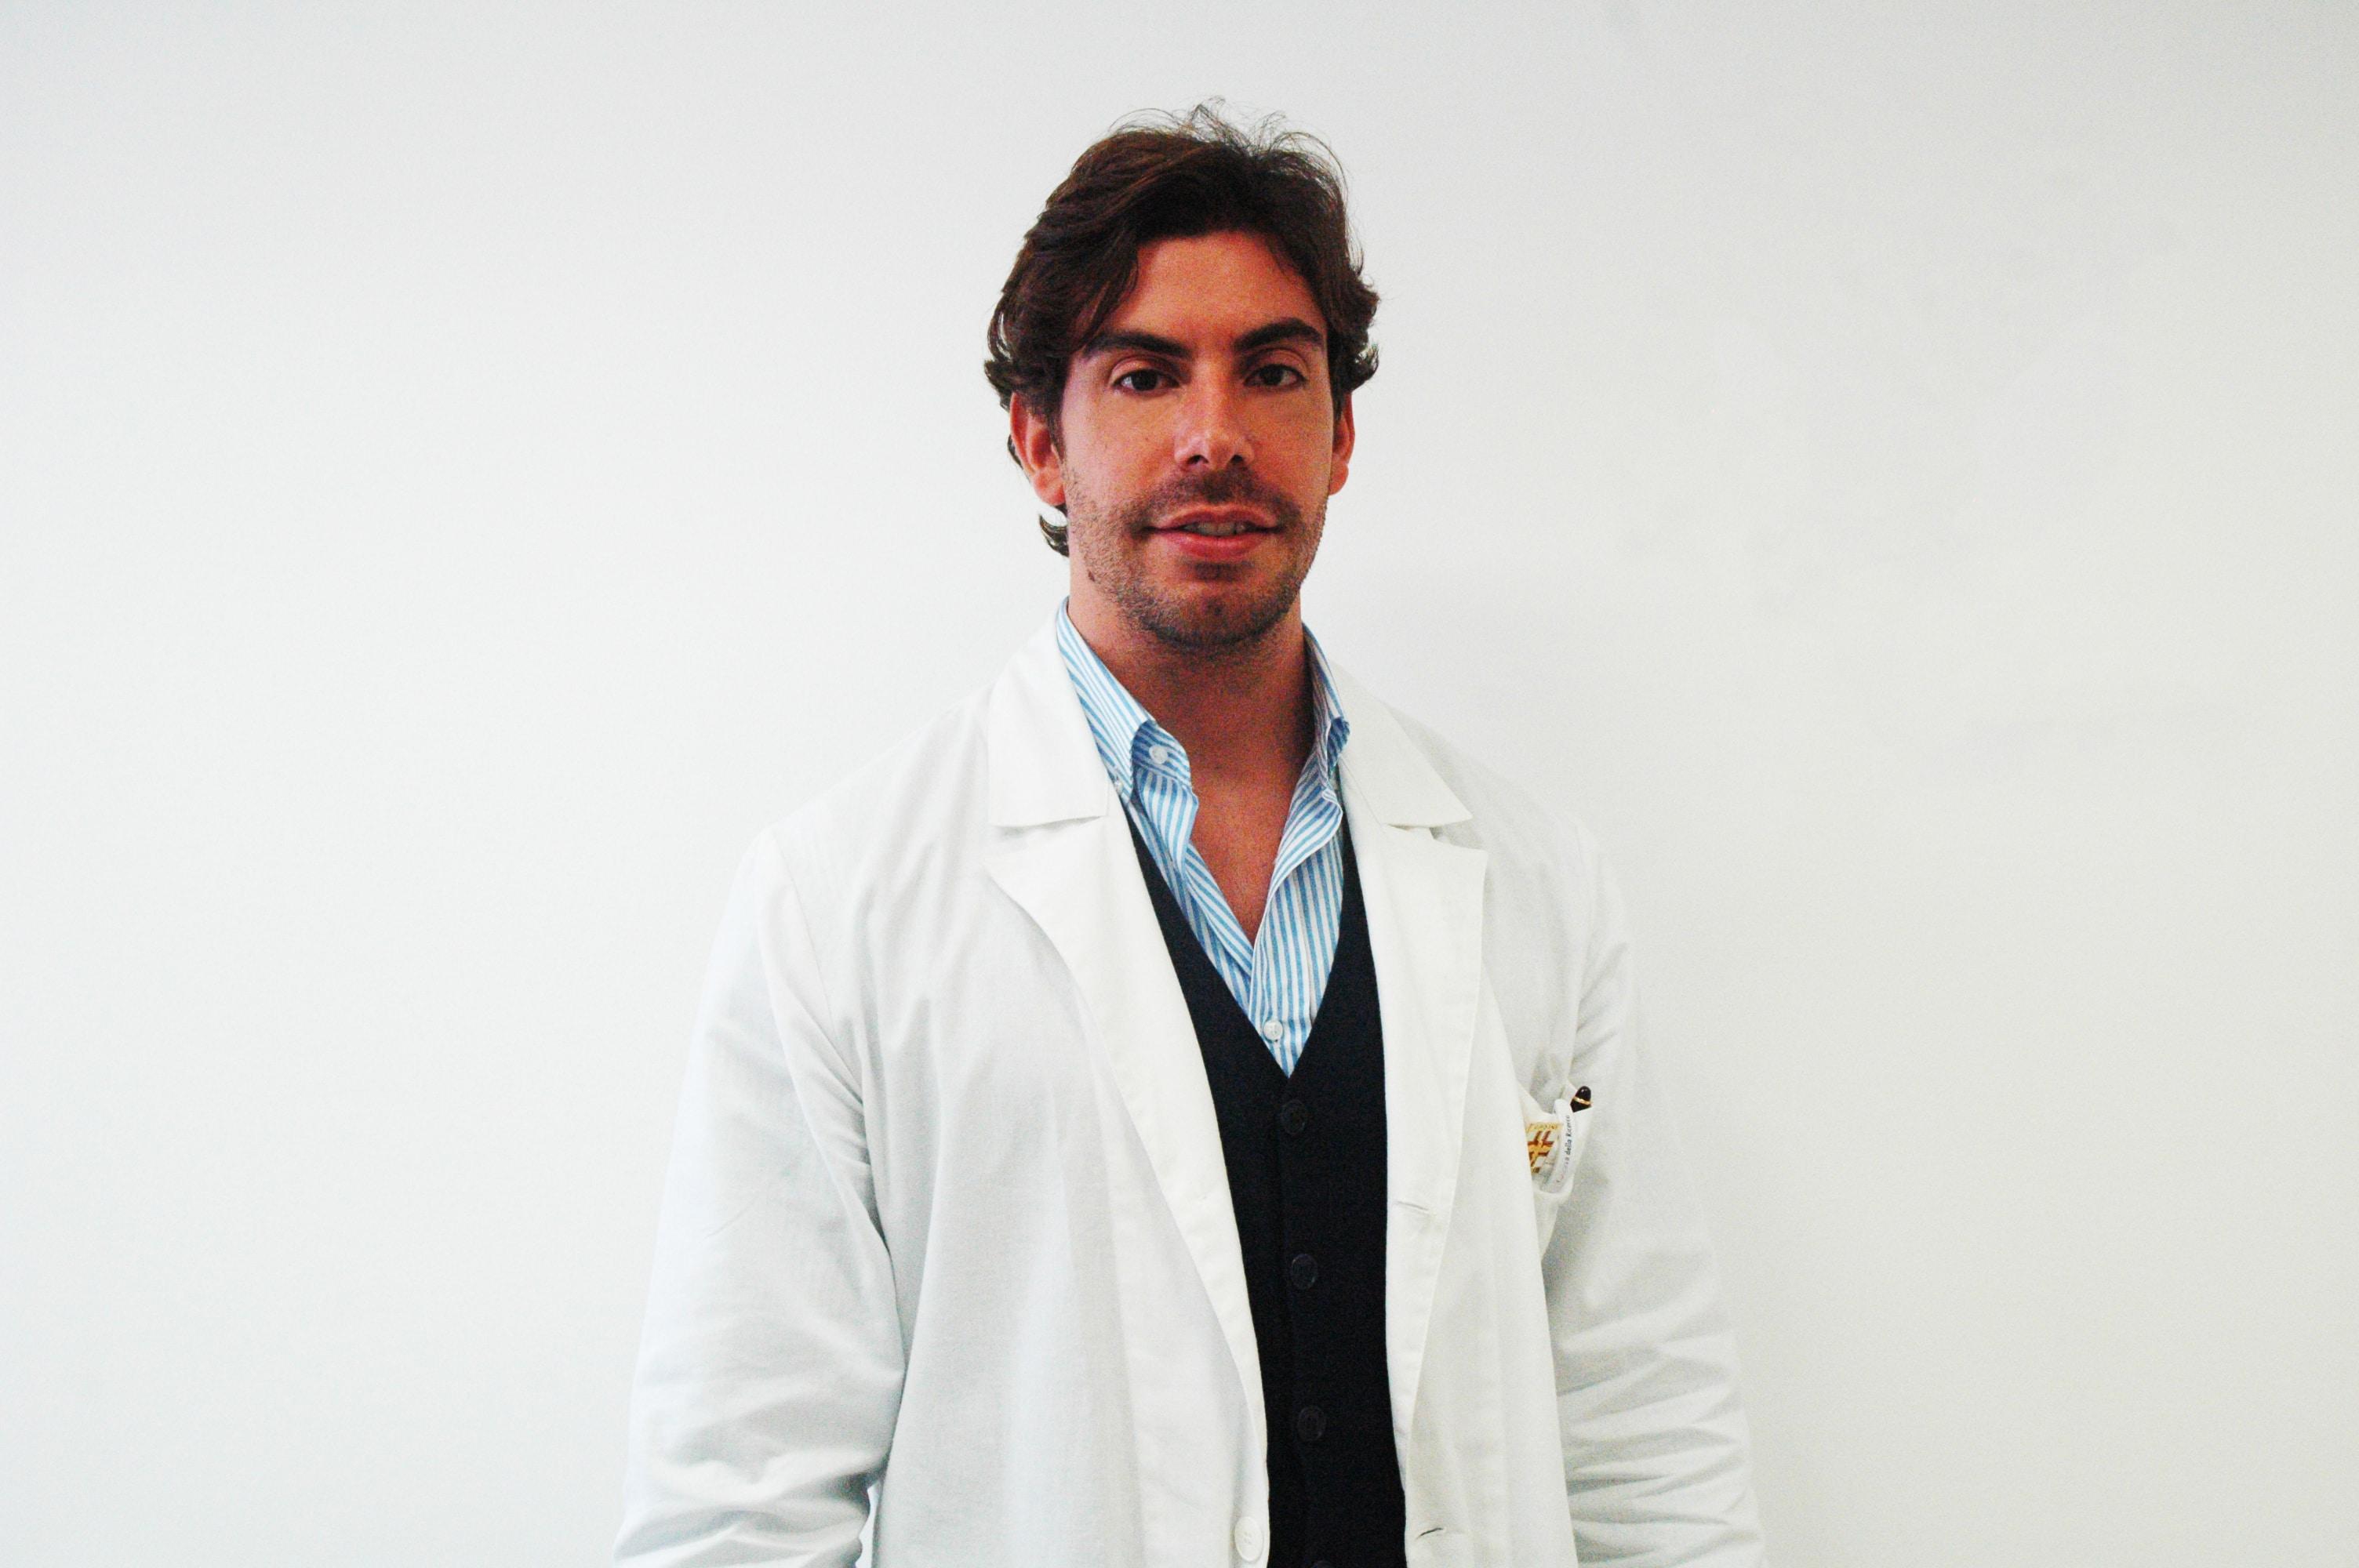 Dott.Pietro Mignano